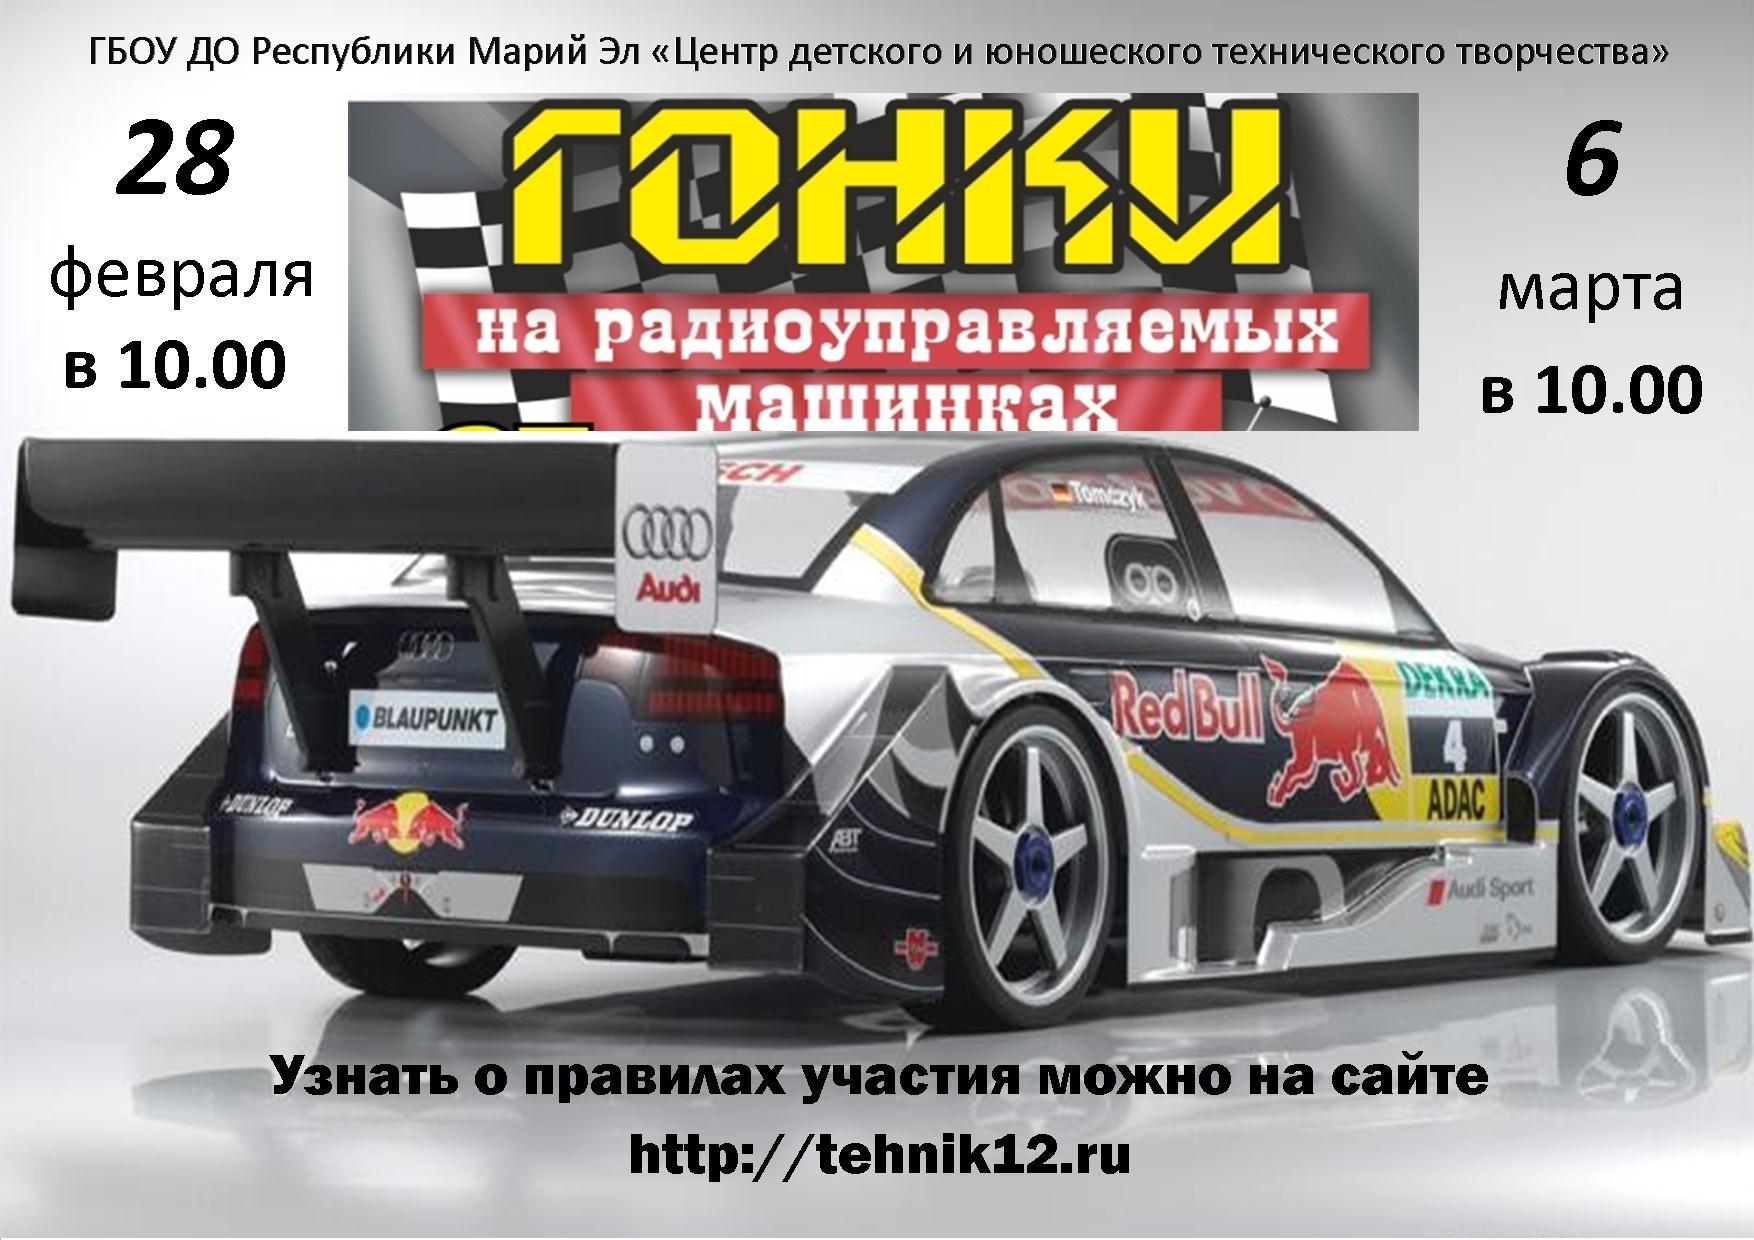 афиша на гонки 28 февраля (1)